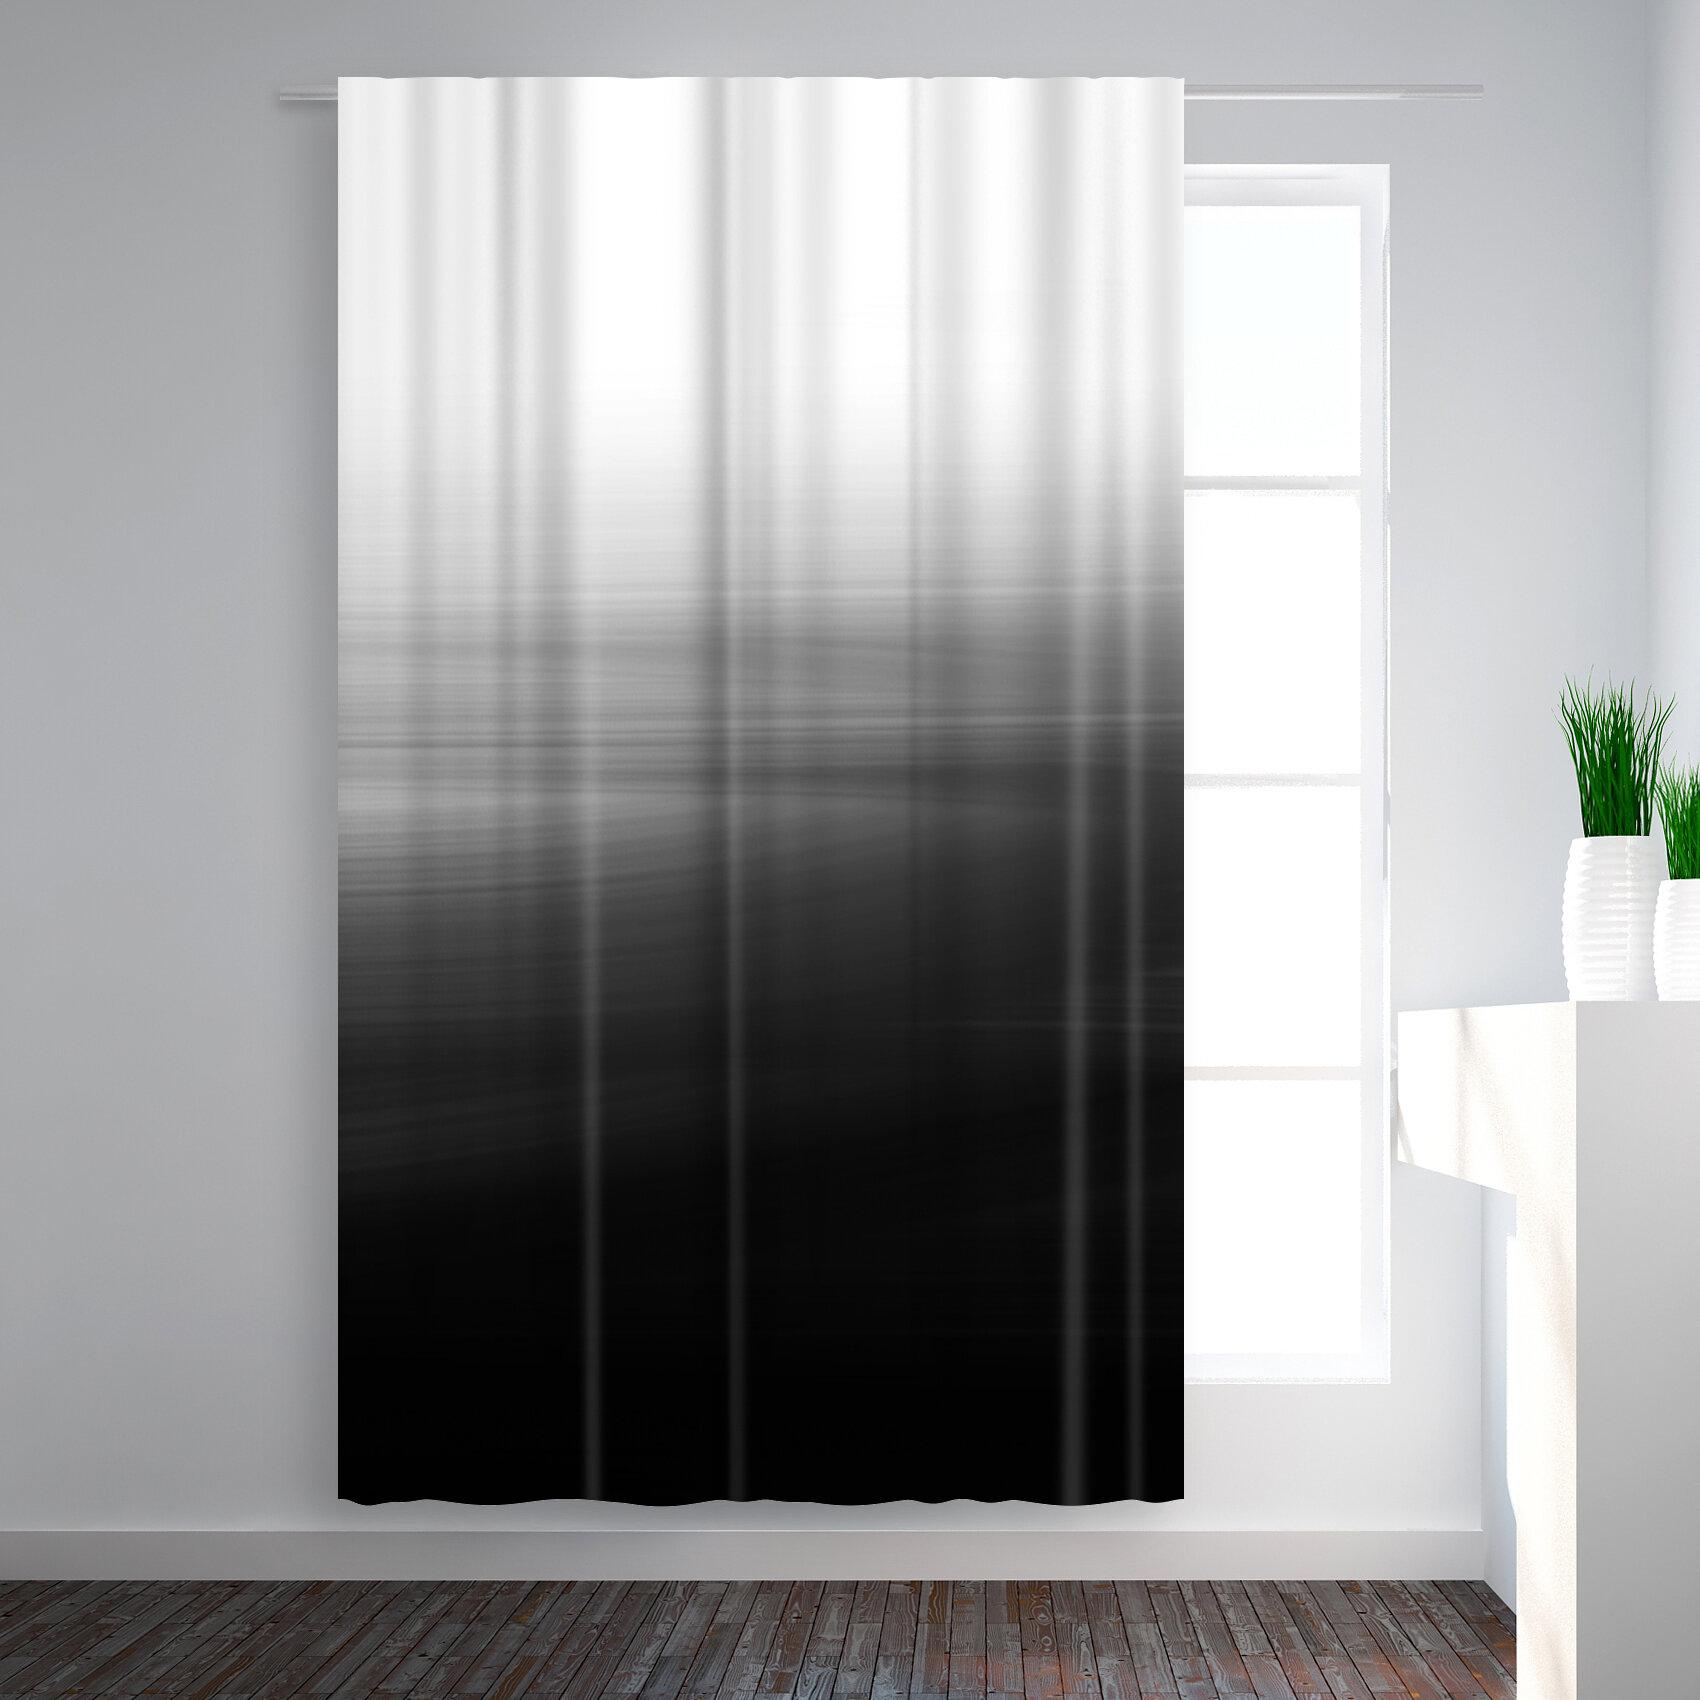 East Urban Home Emanuela Carratoni Abstract Blackout Rod Pocket Single Curtain Panel Wayfair